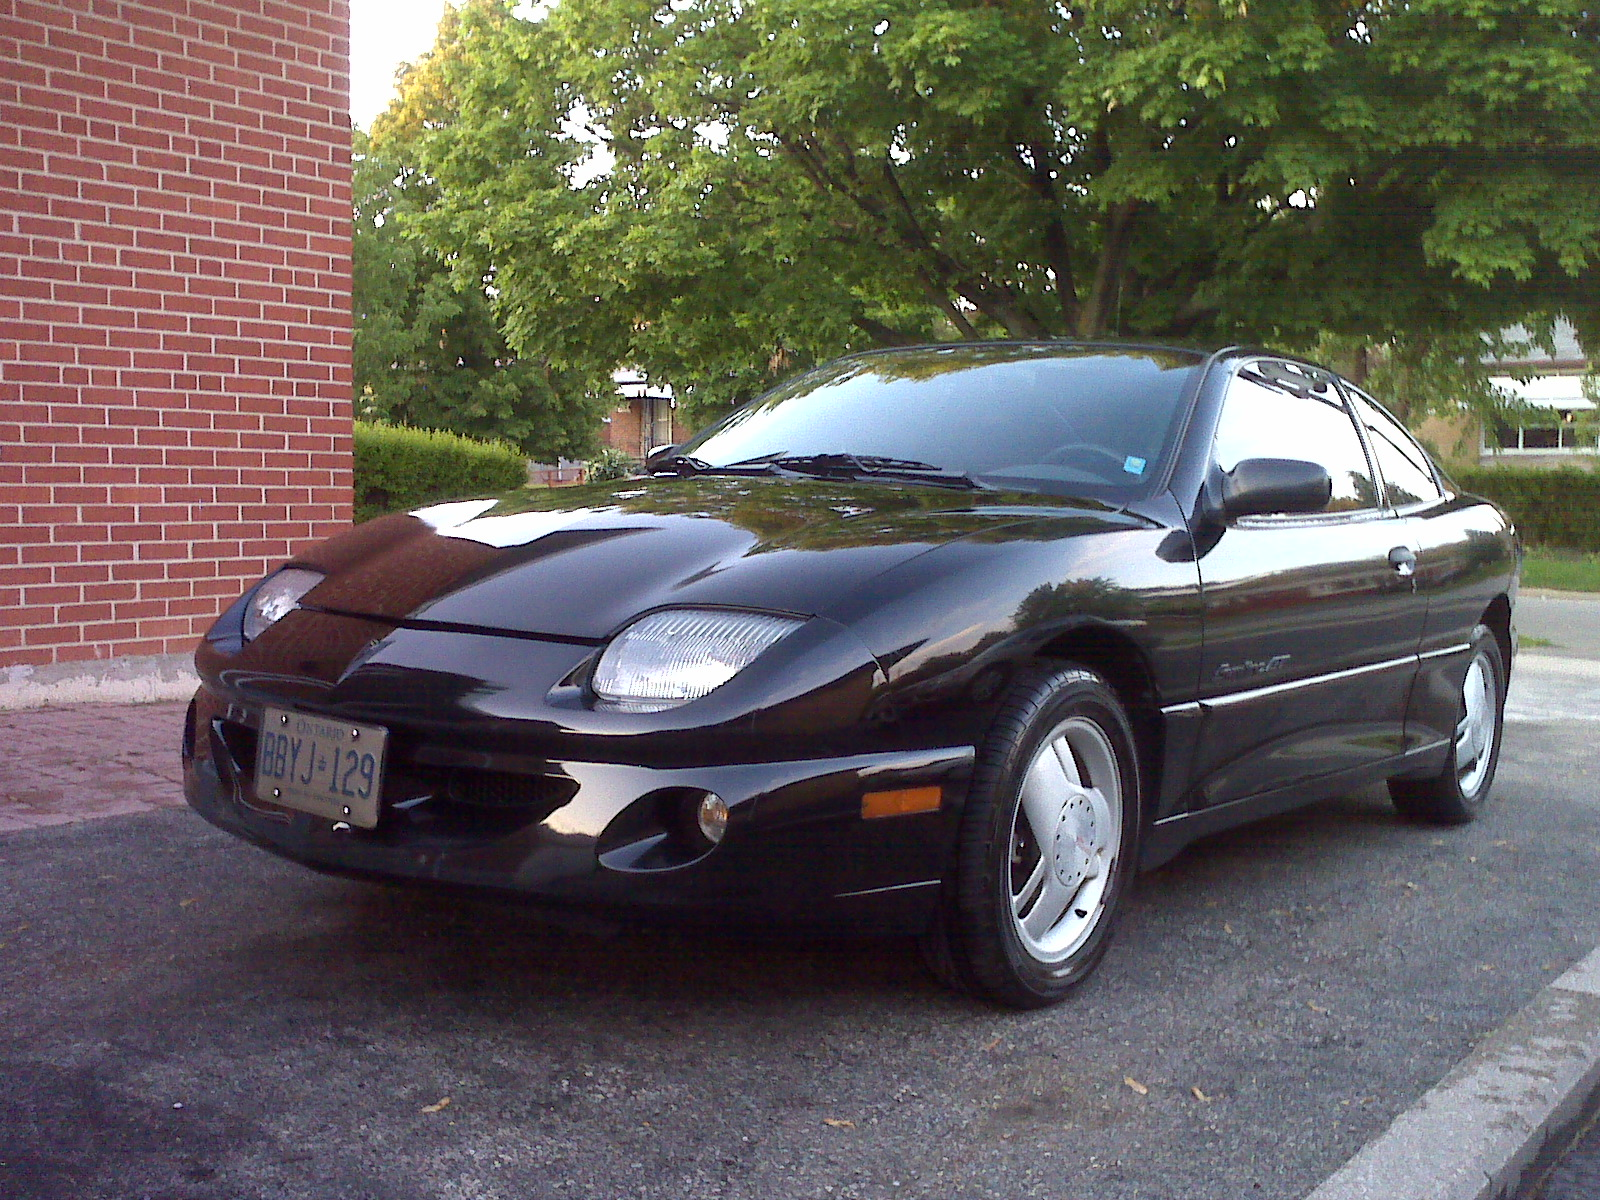 1998 Pontiac Sunfire Image 8